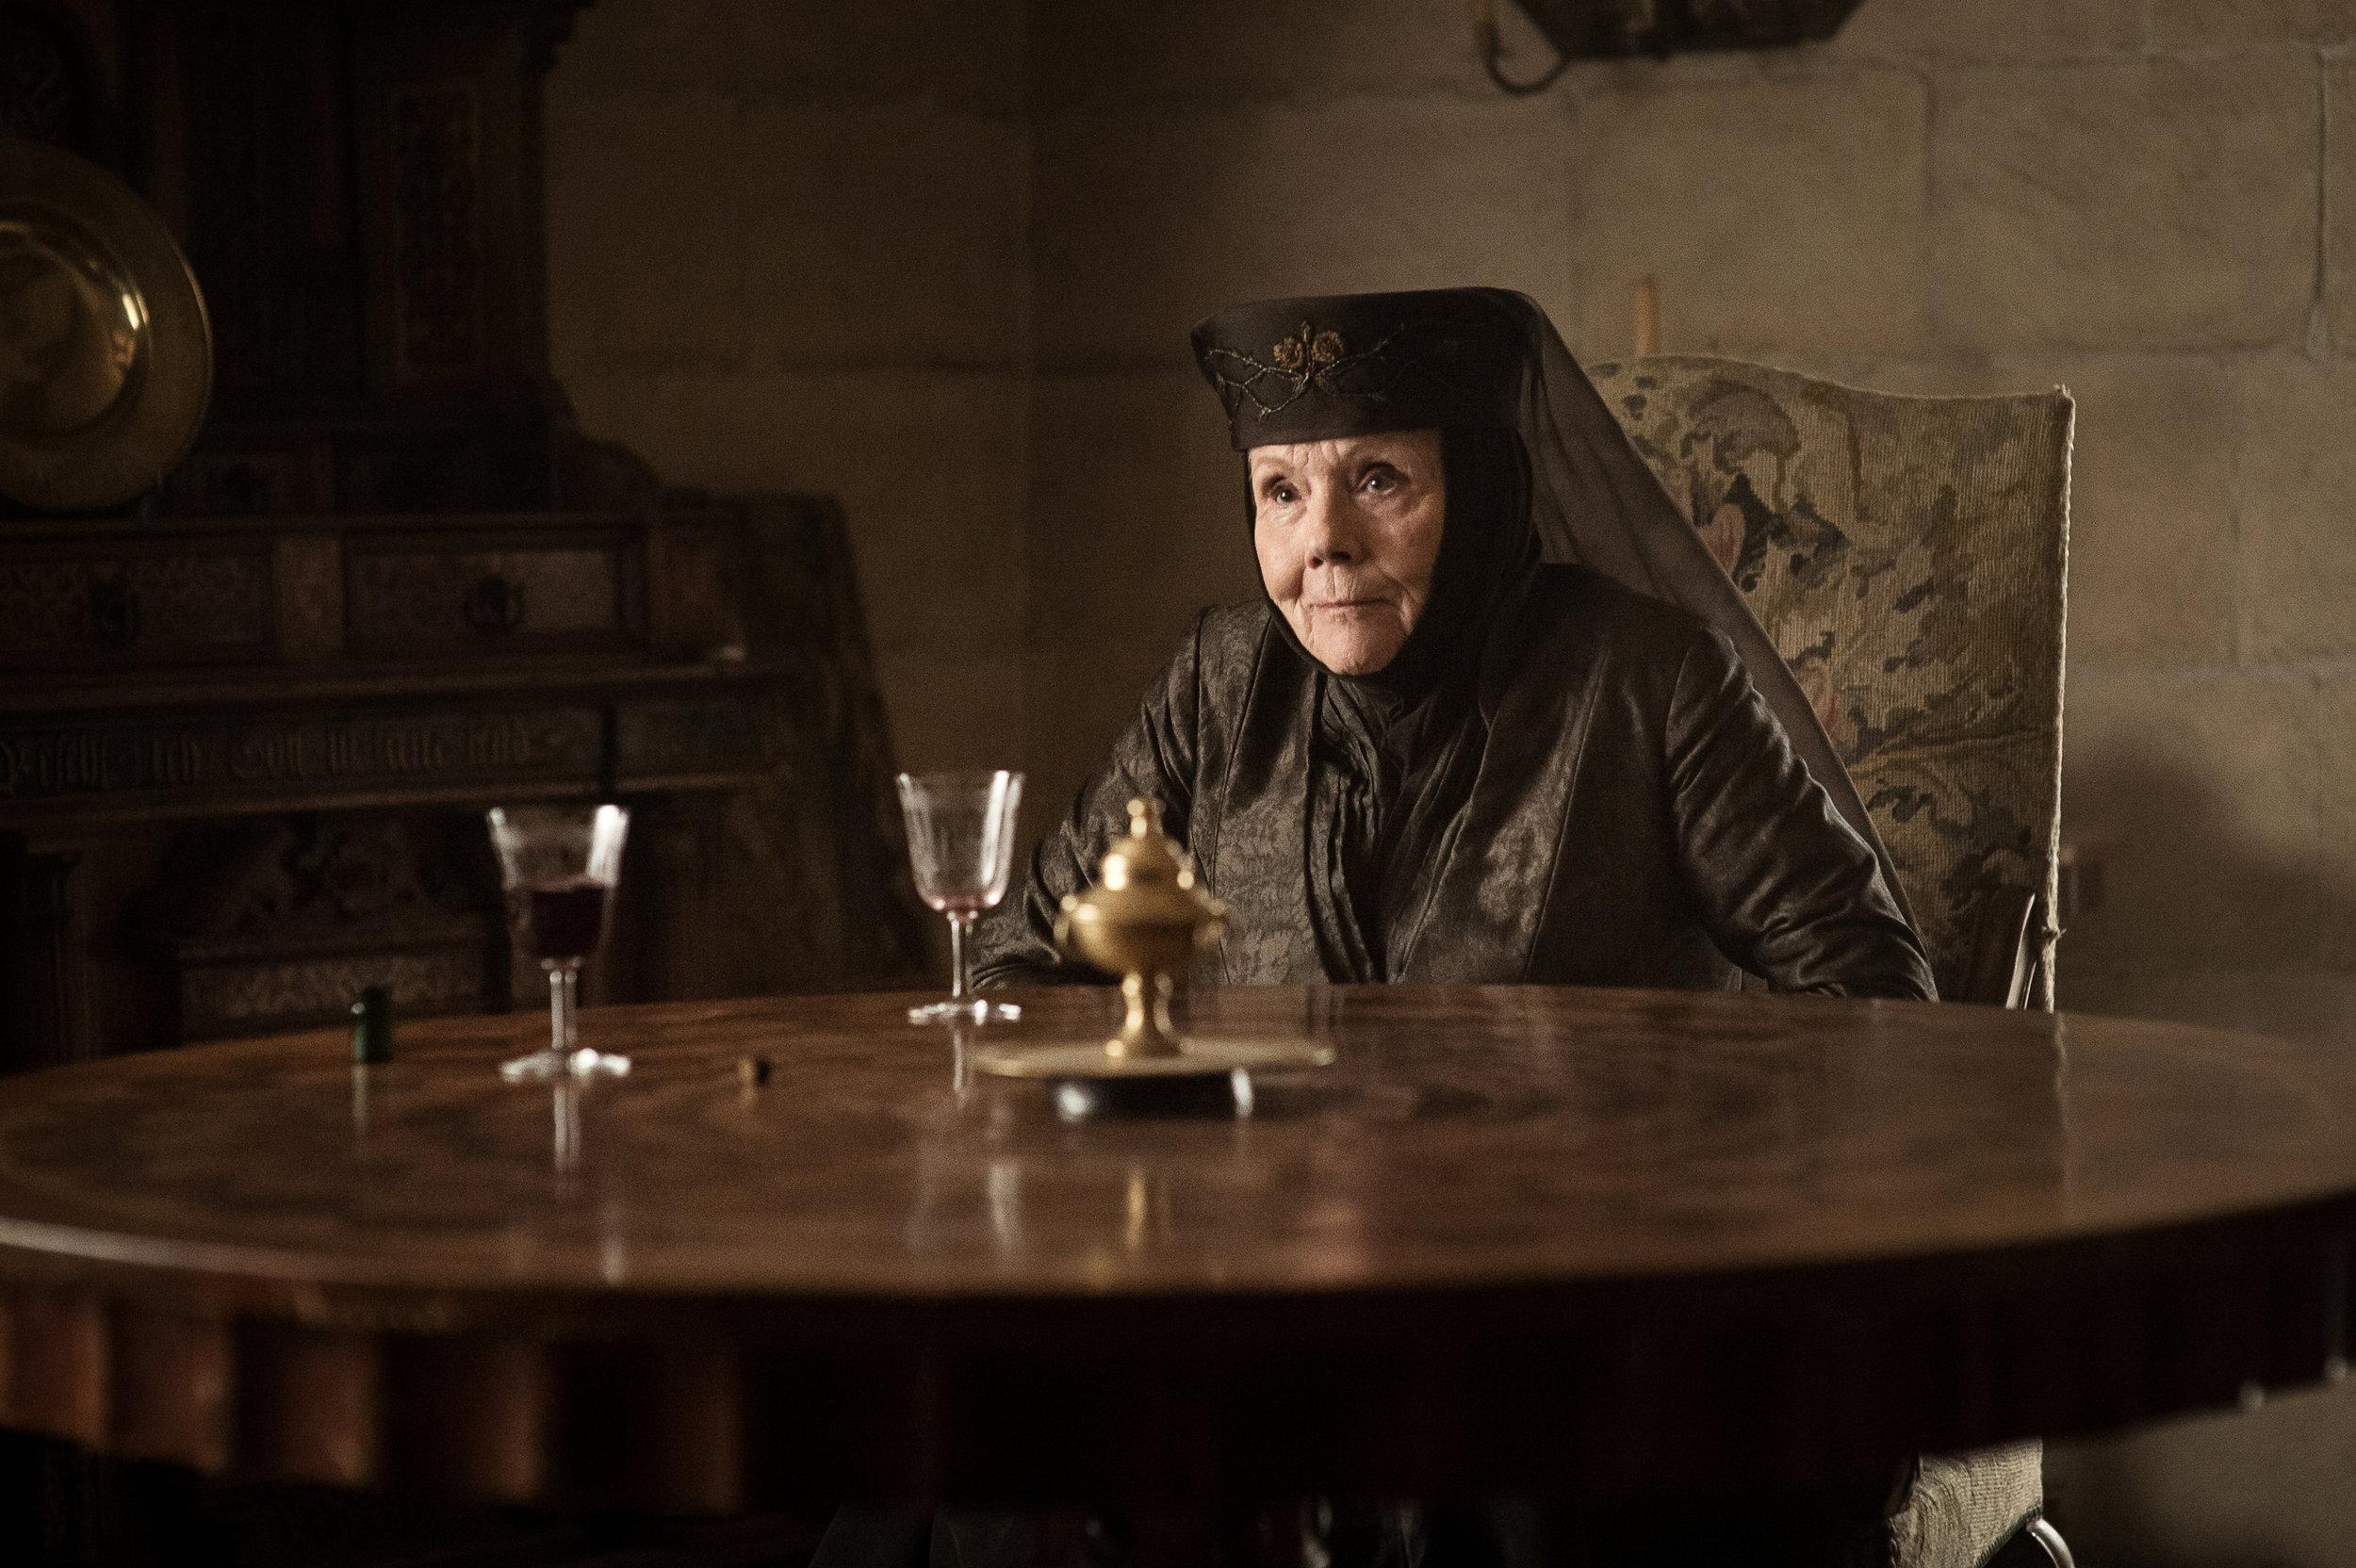 lady-olenna-tyrell-game-thrones.jpg